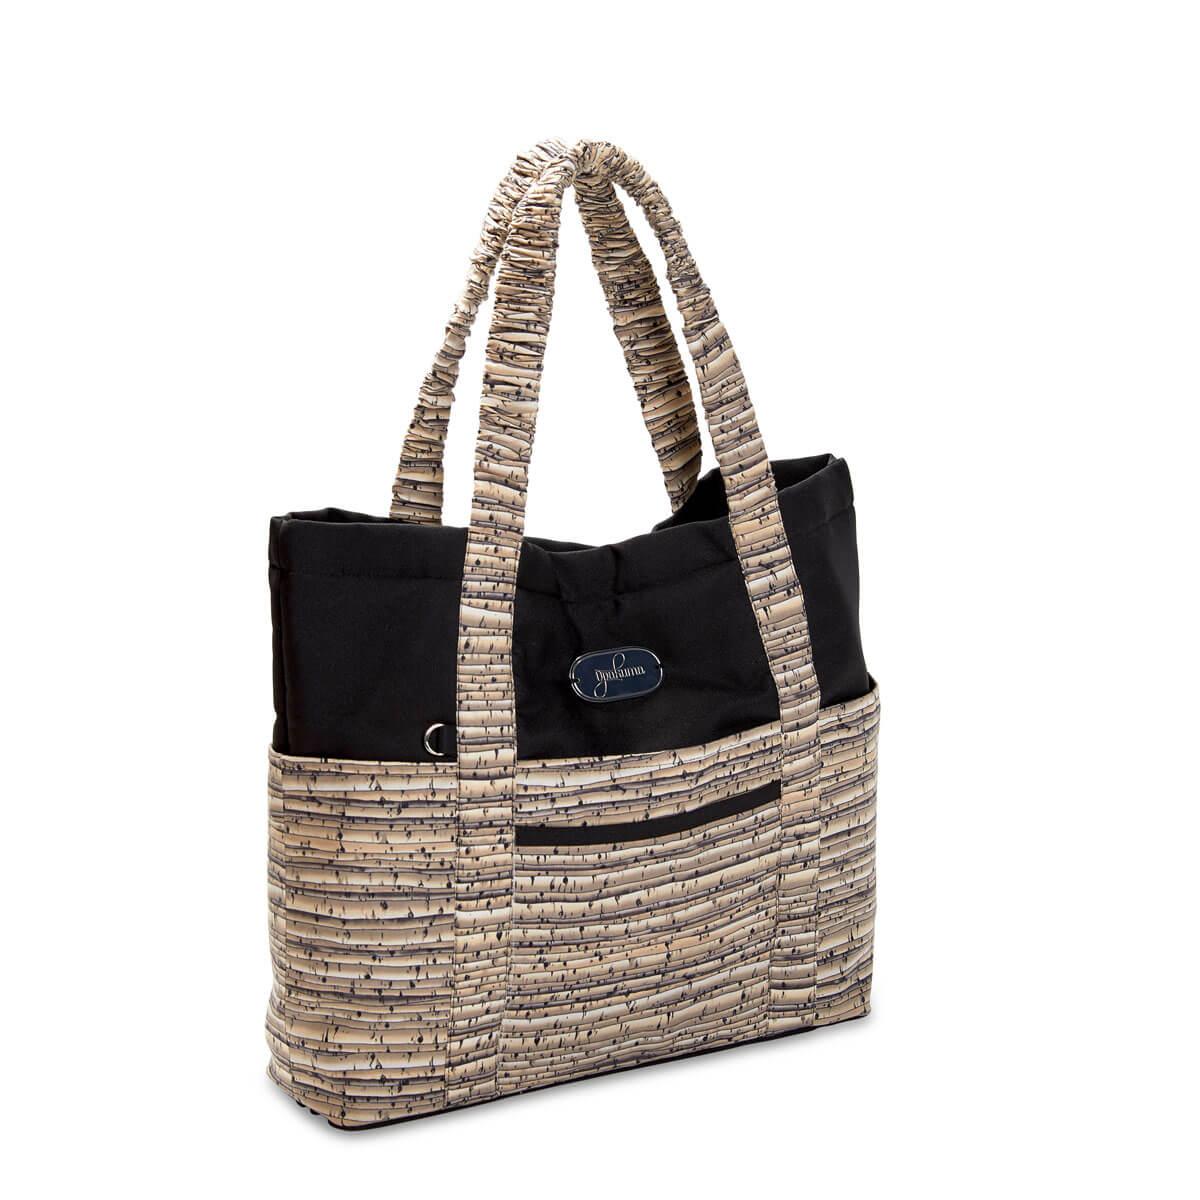 6323dc7e9e Tote Bag Set Knock on Wood - Opakuma